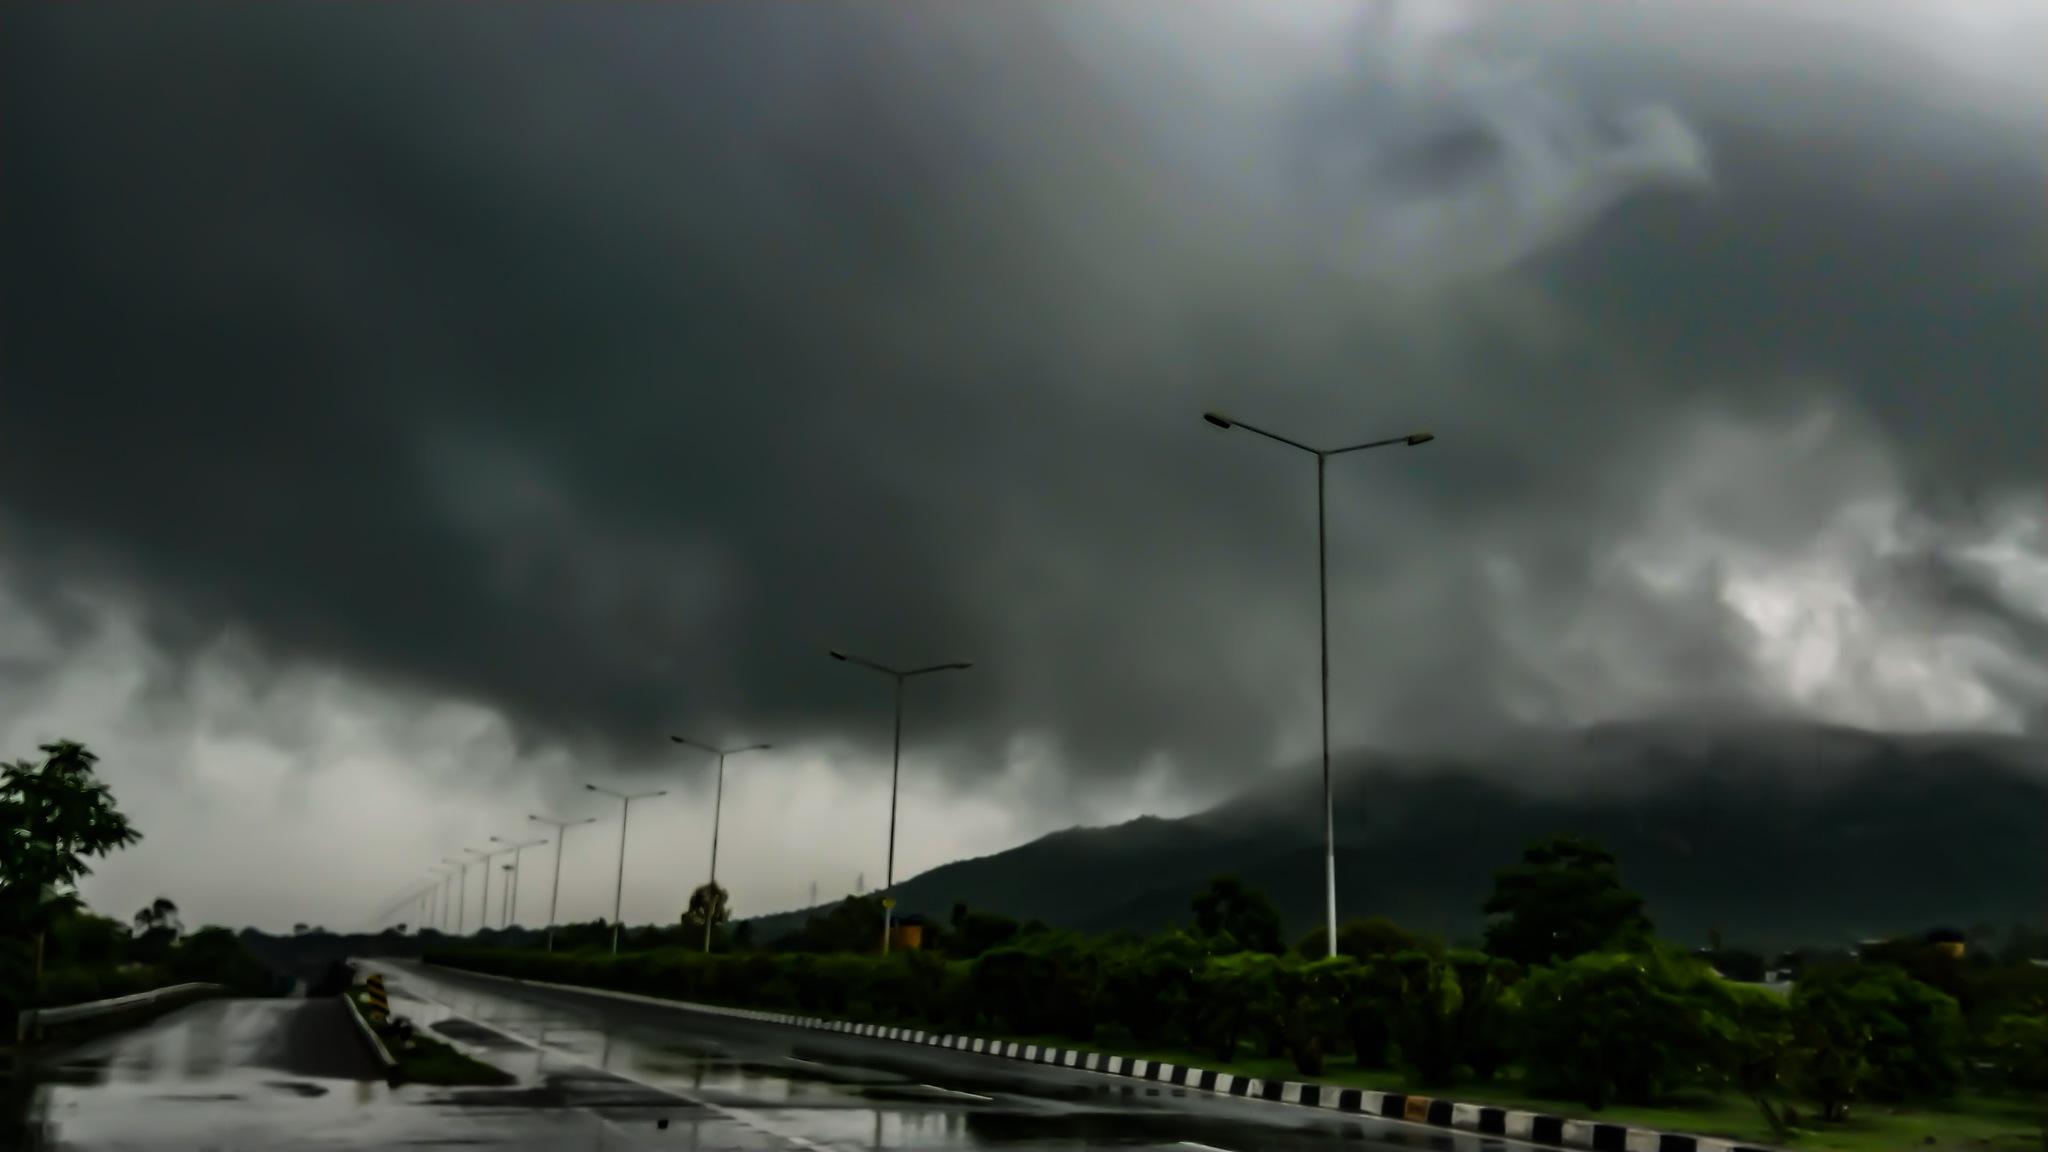 Rainy Click by Official Gaurav Mohnot